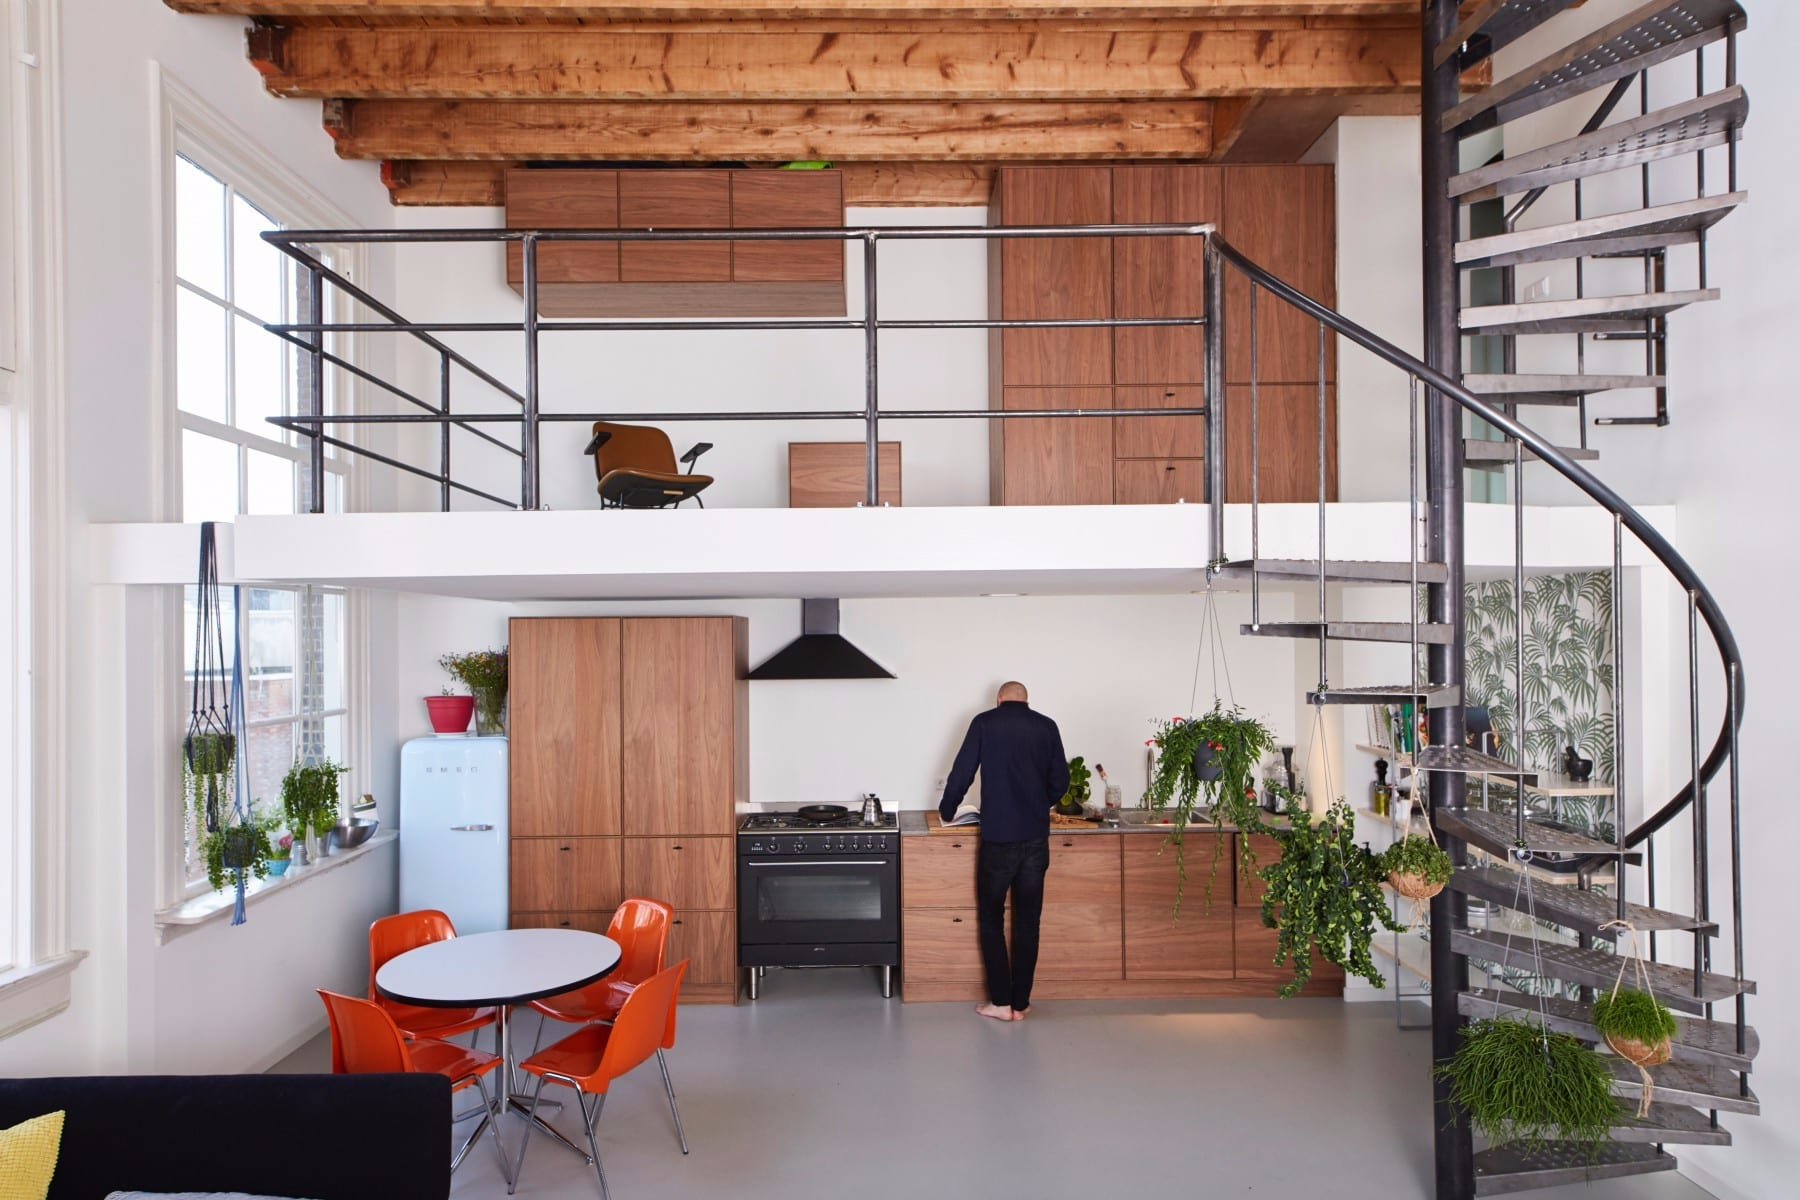 keuken industriele loft home design idee n en meubilair inspiraties